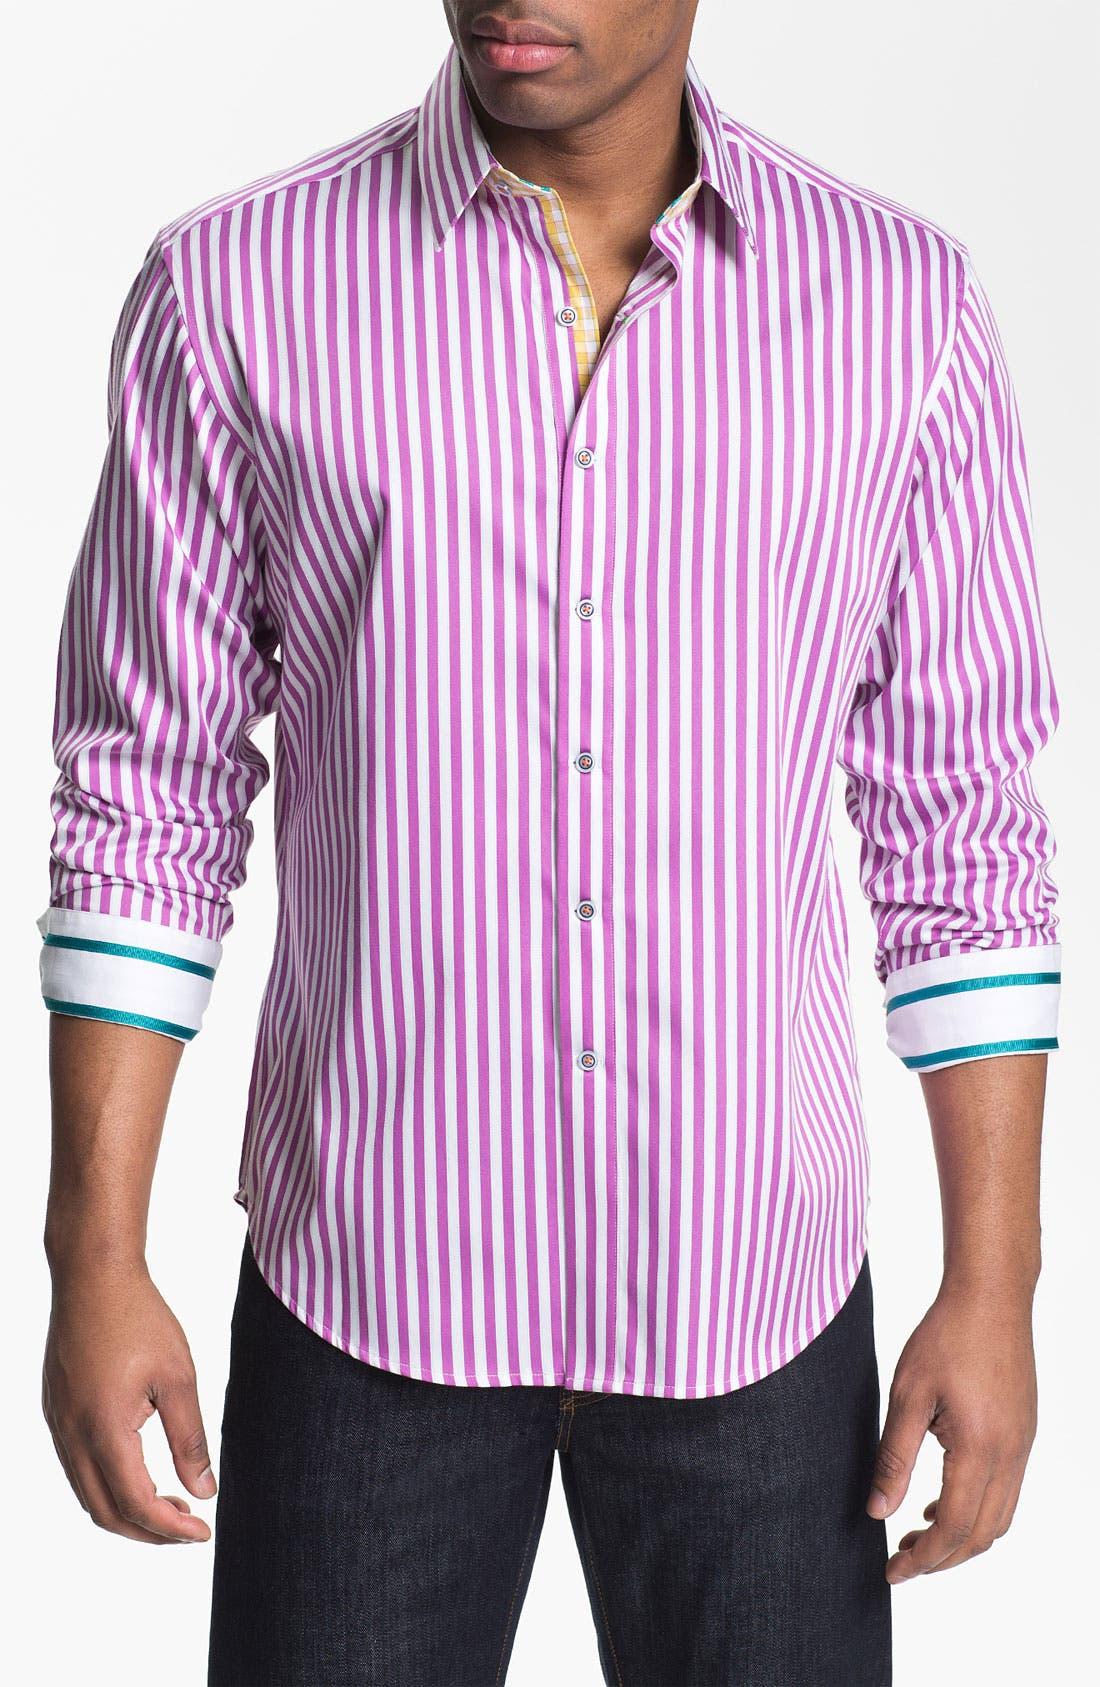 Alternate Image 1 Selected - Robert Graham 'Lanai' Sport Shirt